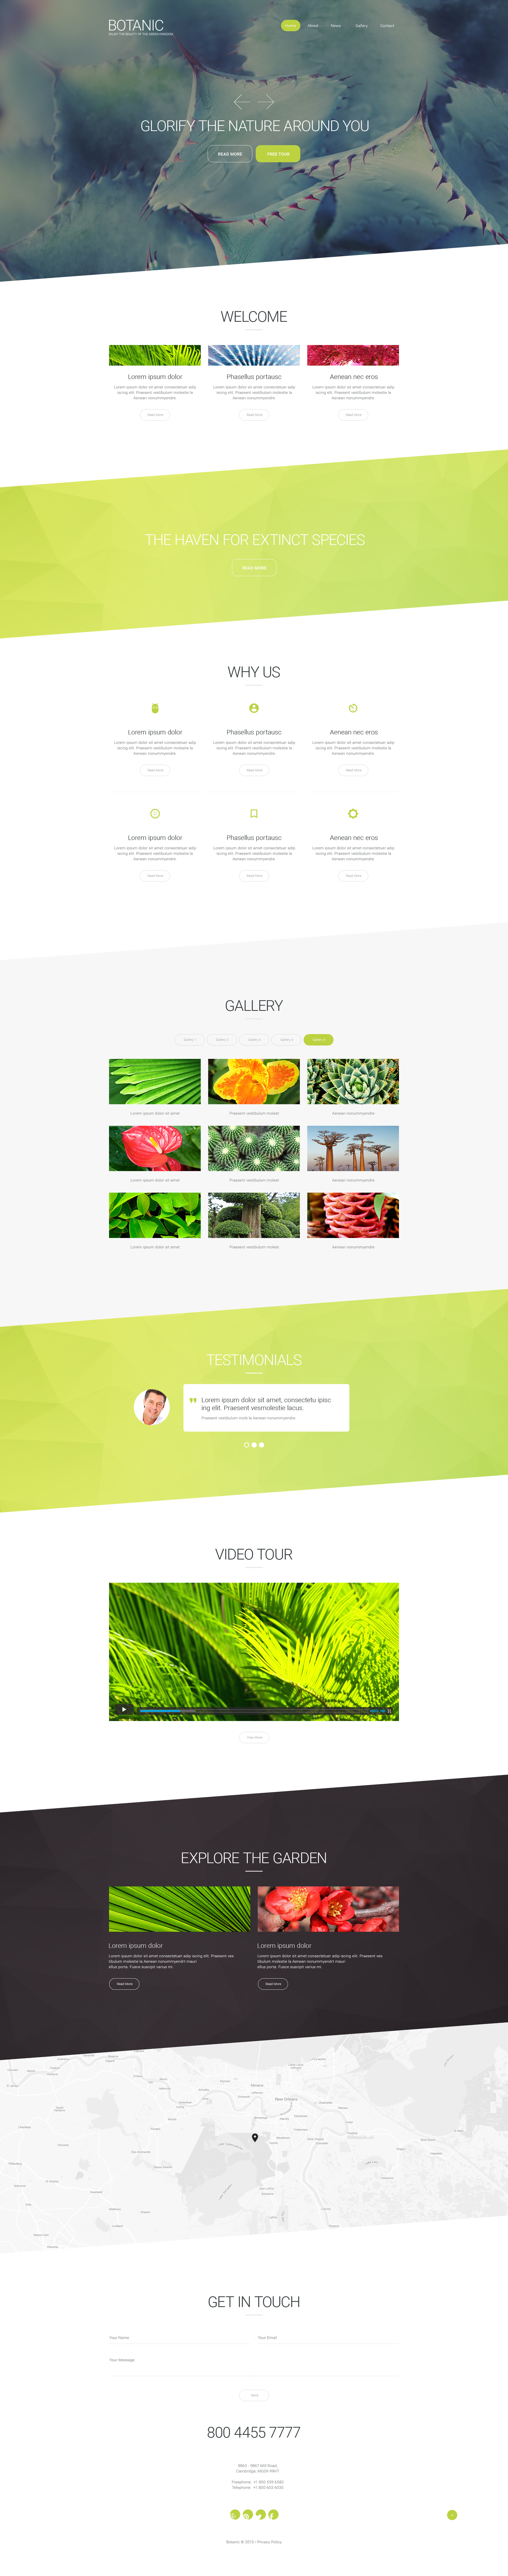 Best Garden Design Website Templates